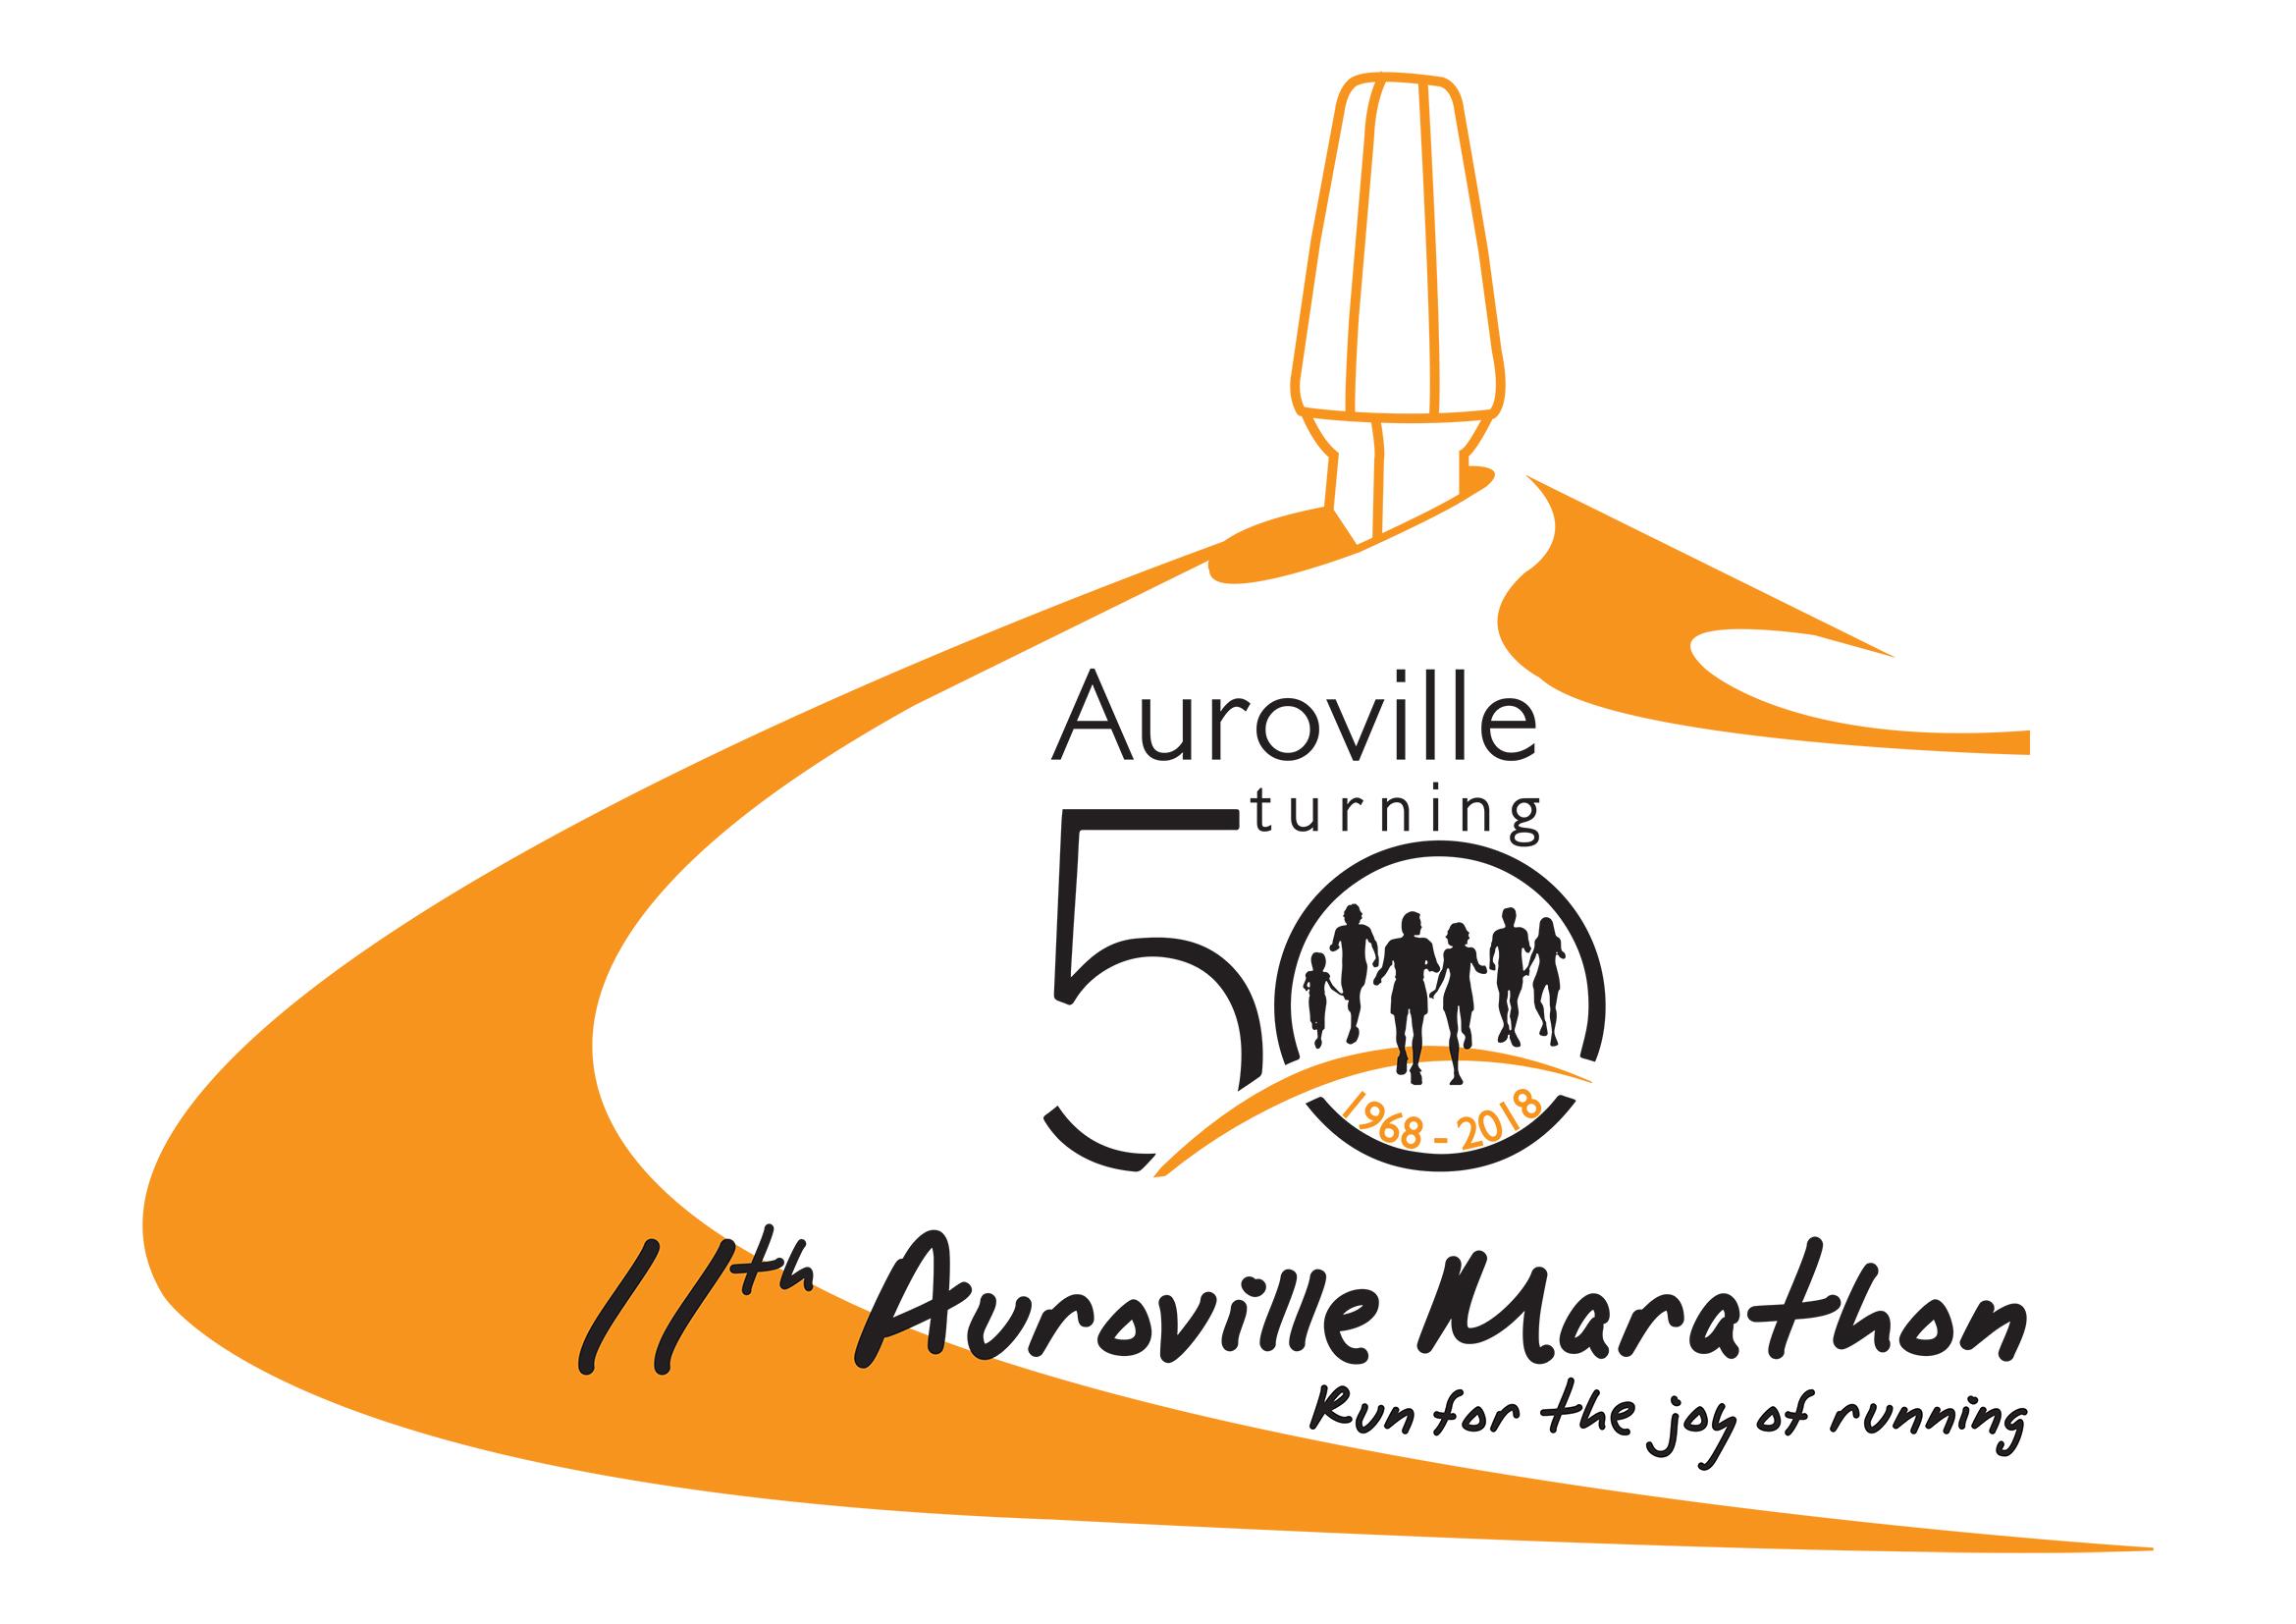 11th Marathon